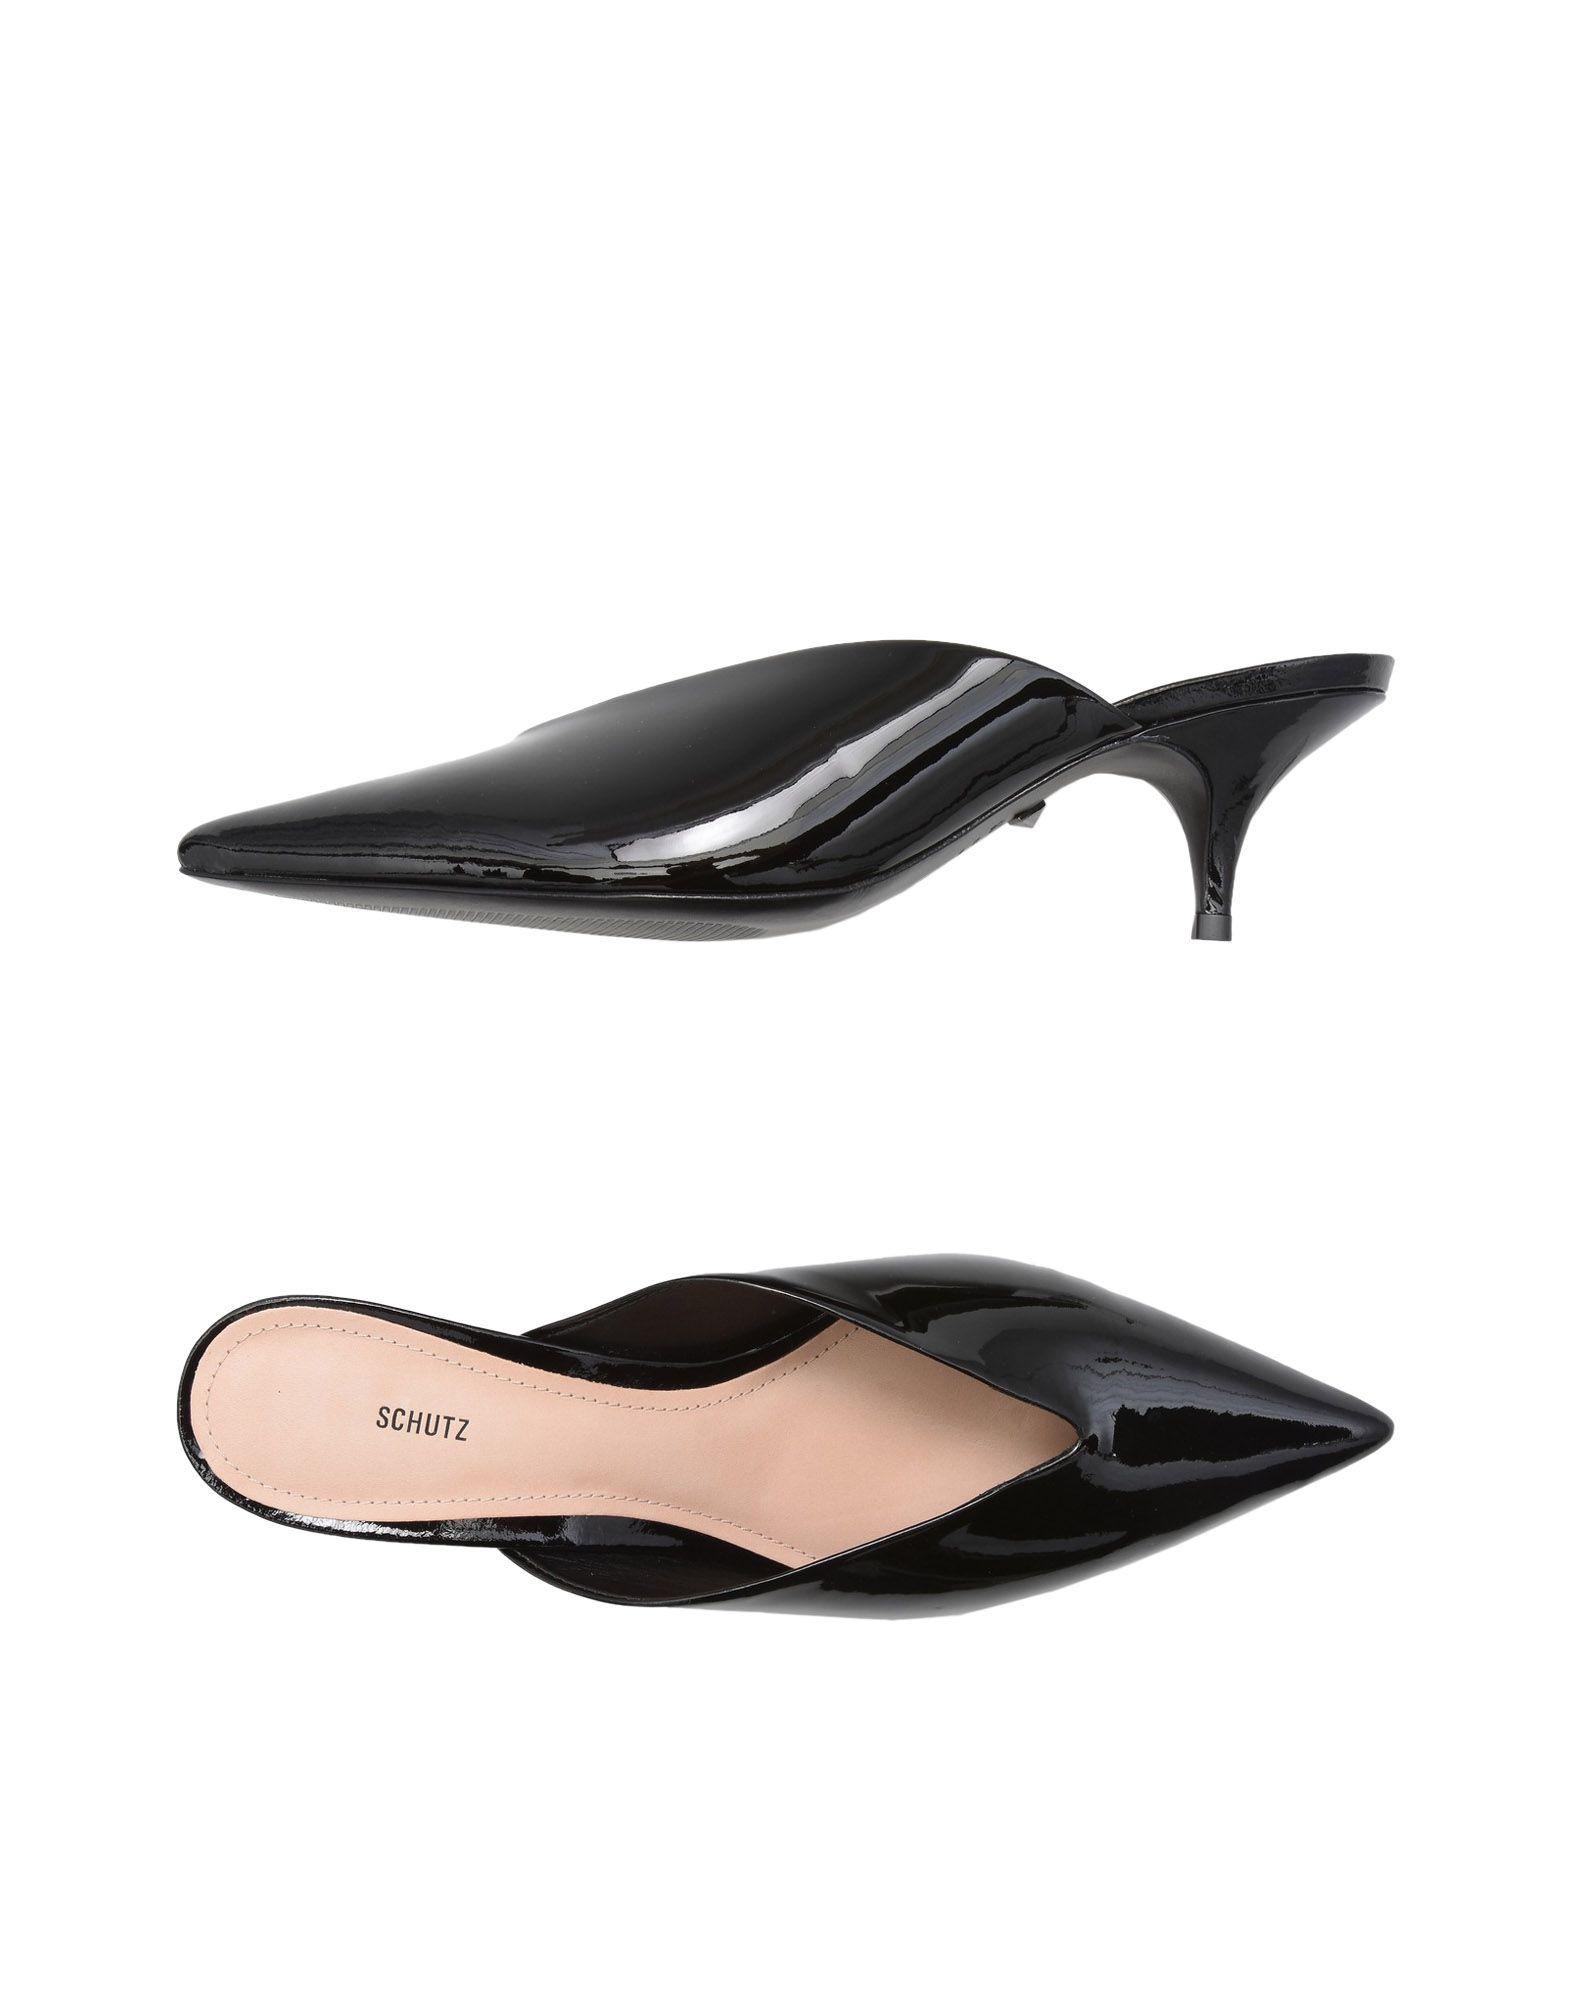 Schutz Pantoletten Damen  11482173DO Gute Qualität beliebte Schuhe